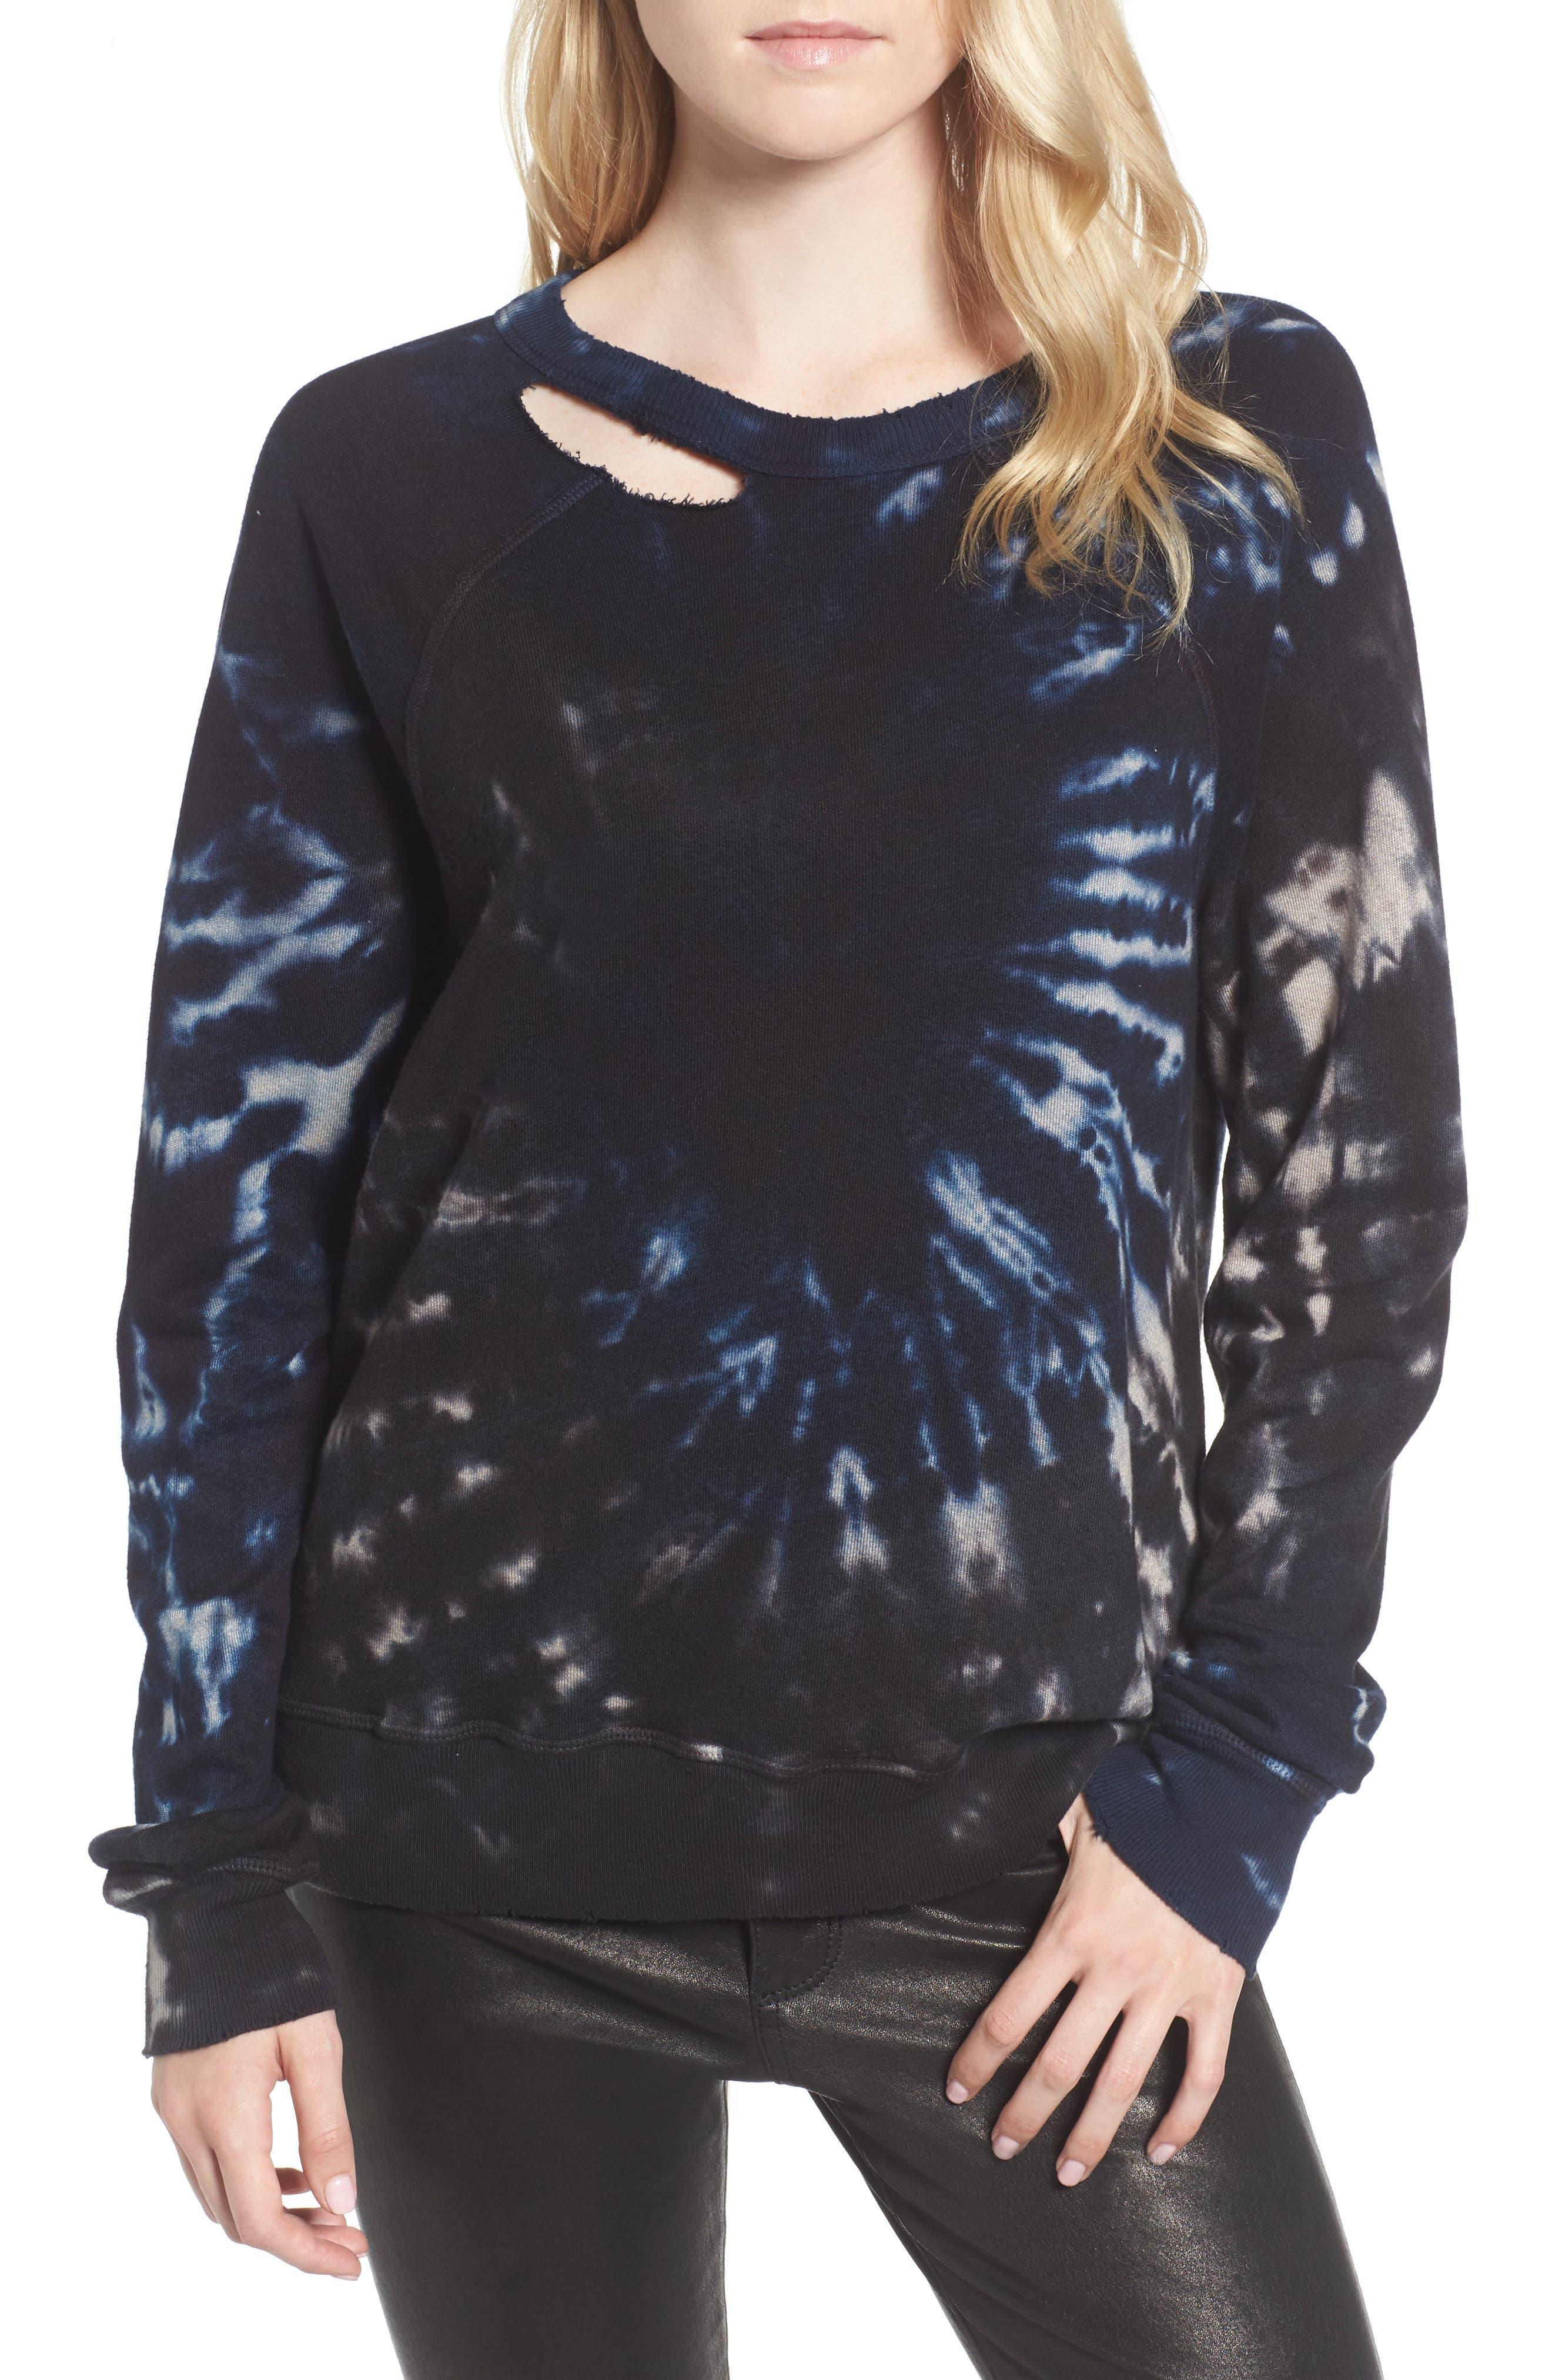 Nic Distressed Sweatshirt,                             Main thumbnail 1, color,                             010